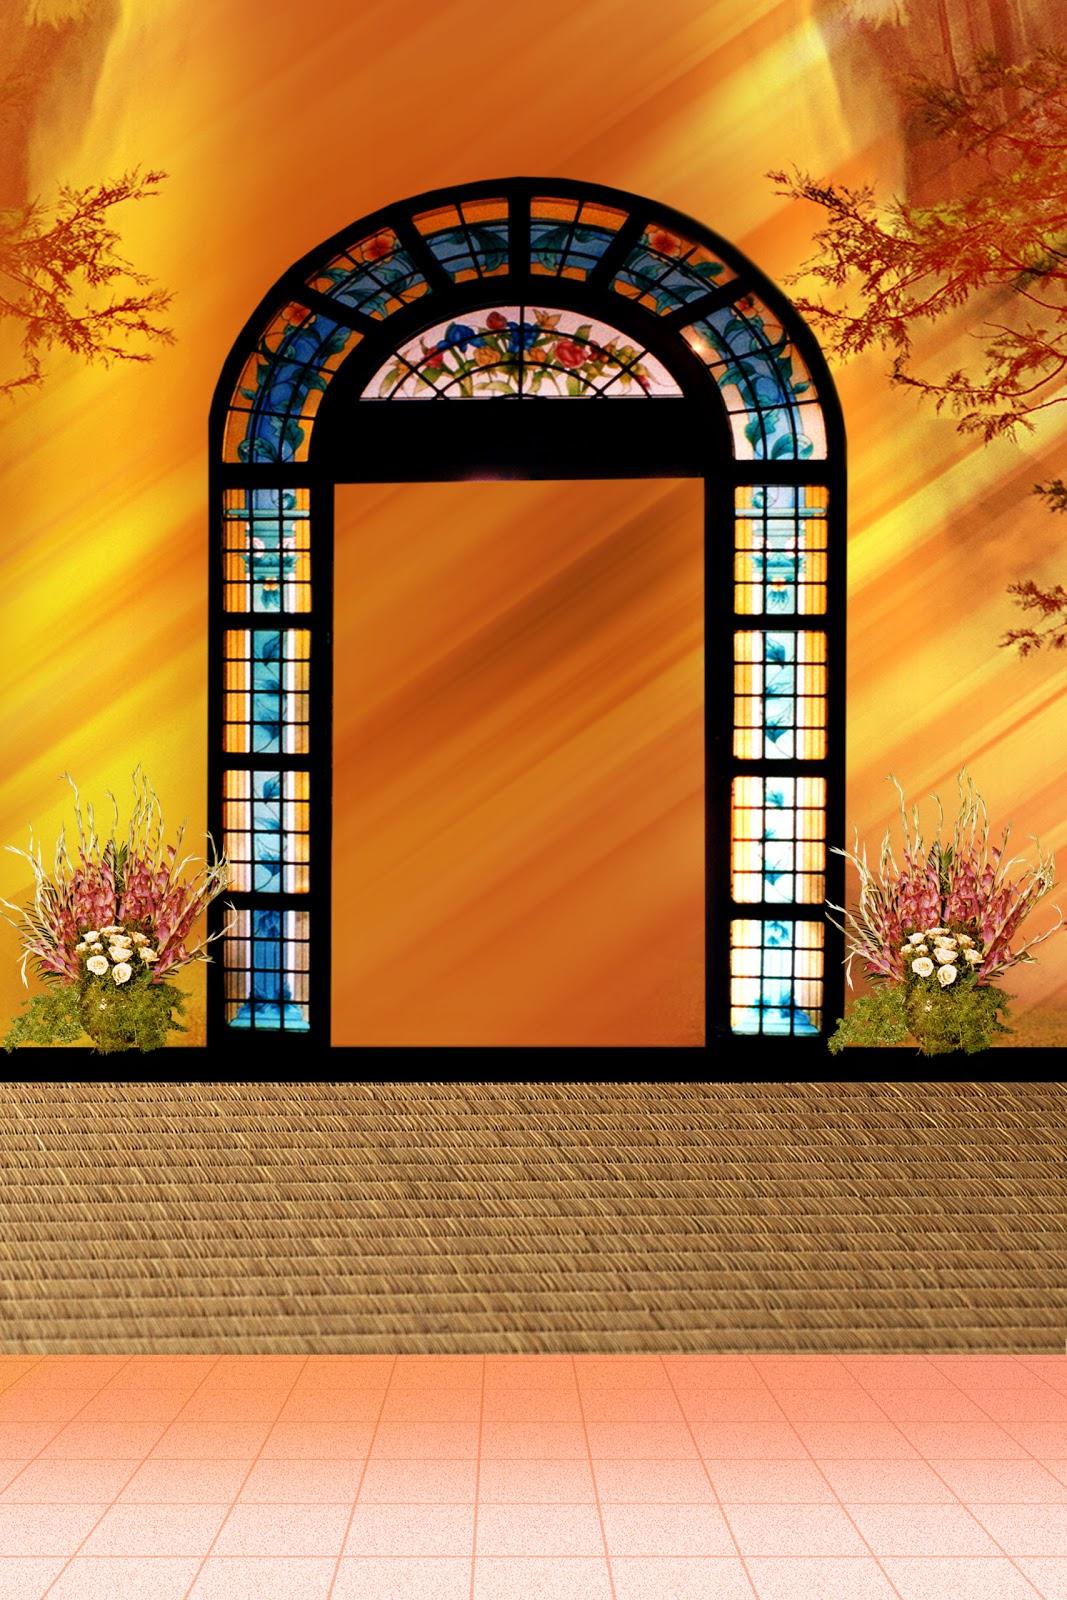 Photo Studio Background Hd Free Download Luckystudio4u